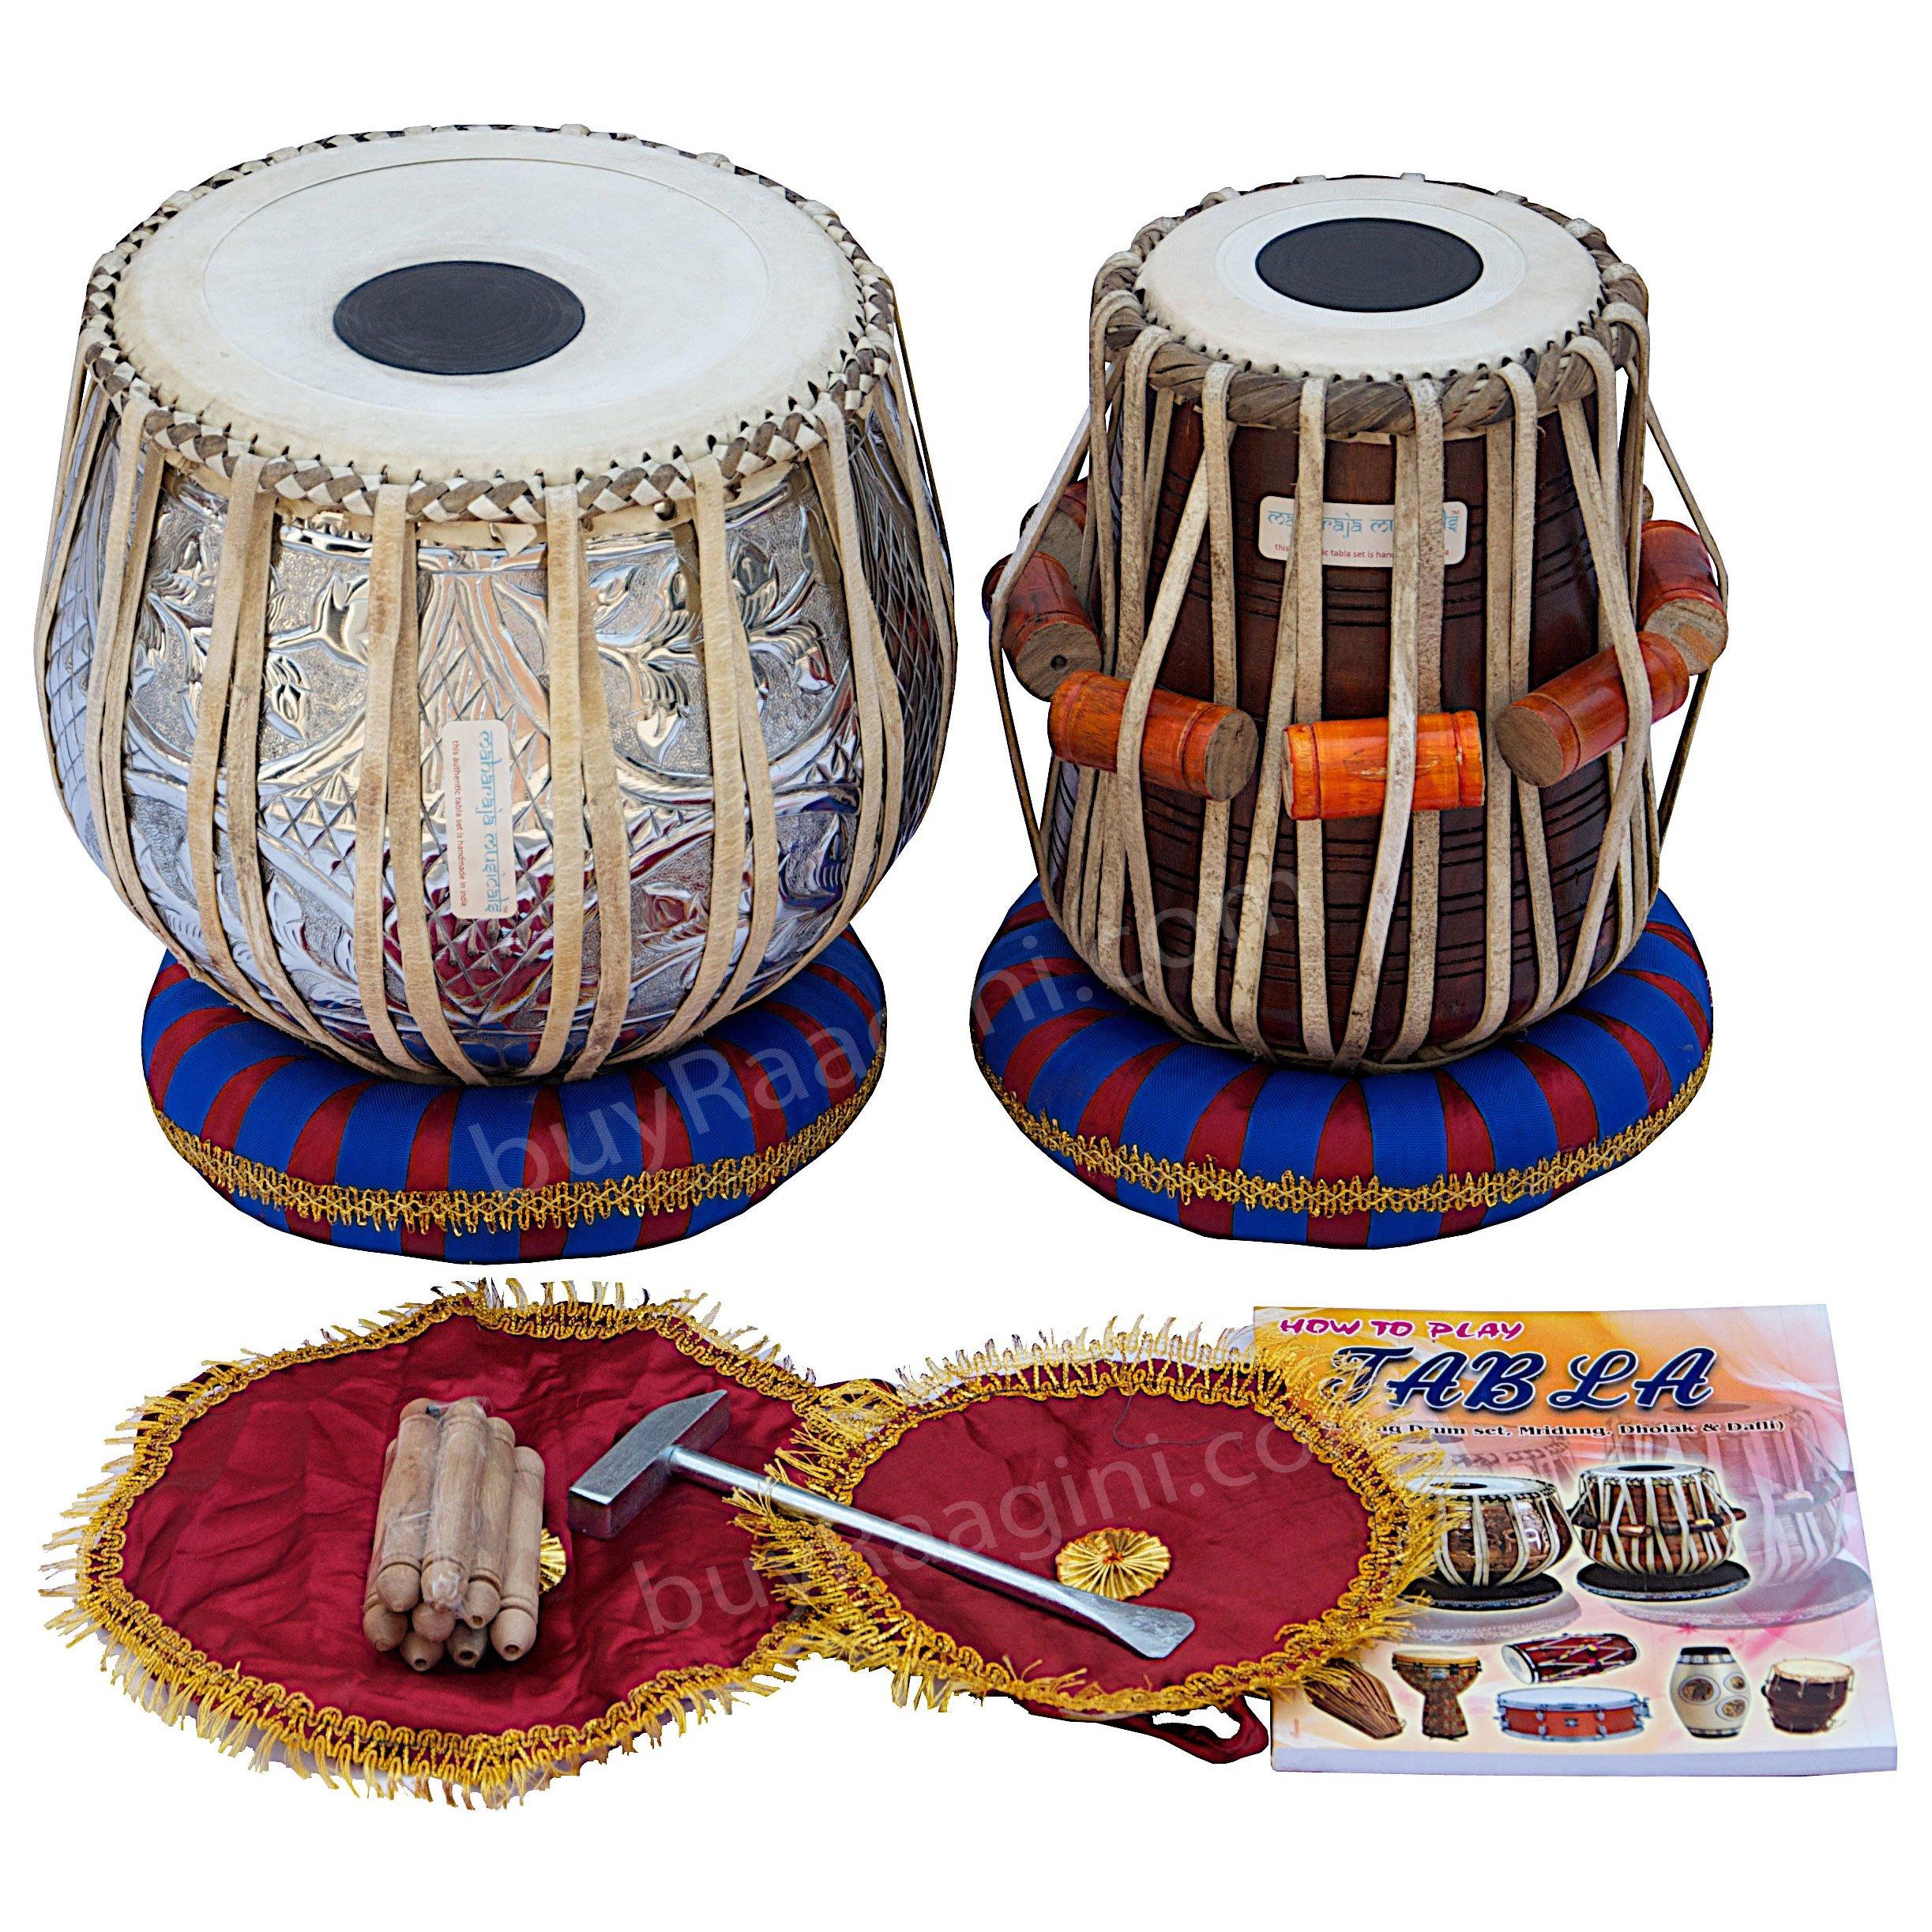 Maharaja Musicals Tabla Set, 3Kg Designer Chromed Copper Bayan, Sheesham Dayan Tabla, Professional Delhi Tabla Drums, Padded Bag, Book, Hammer, Cushions & Cover, Indian Hand Drums (PDI-BEA) by Maharaja Musicals